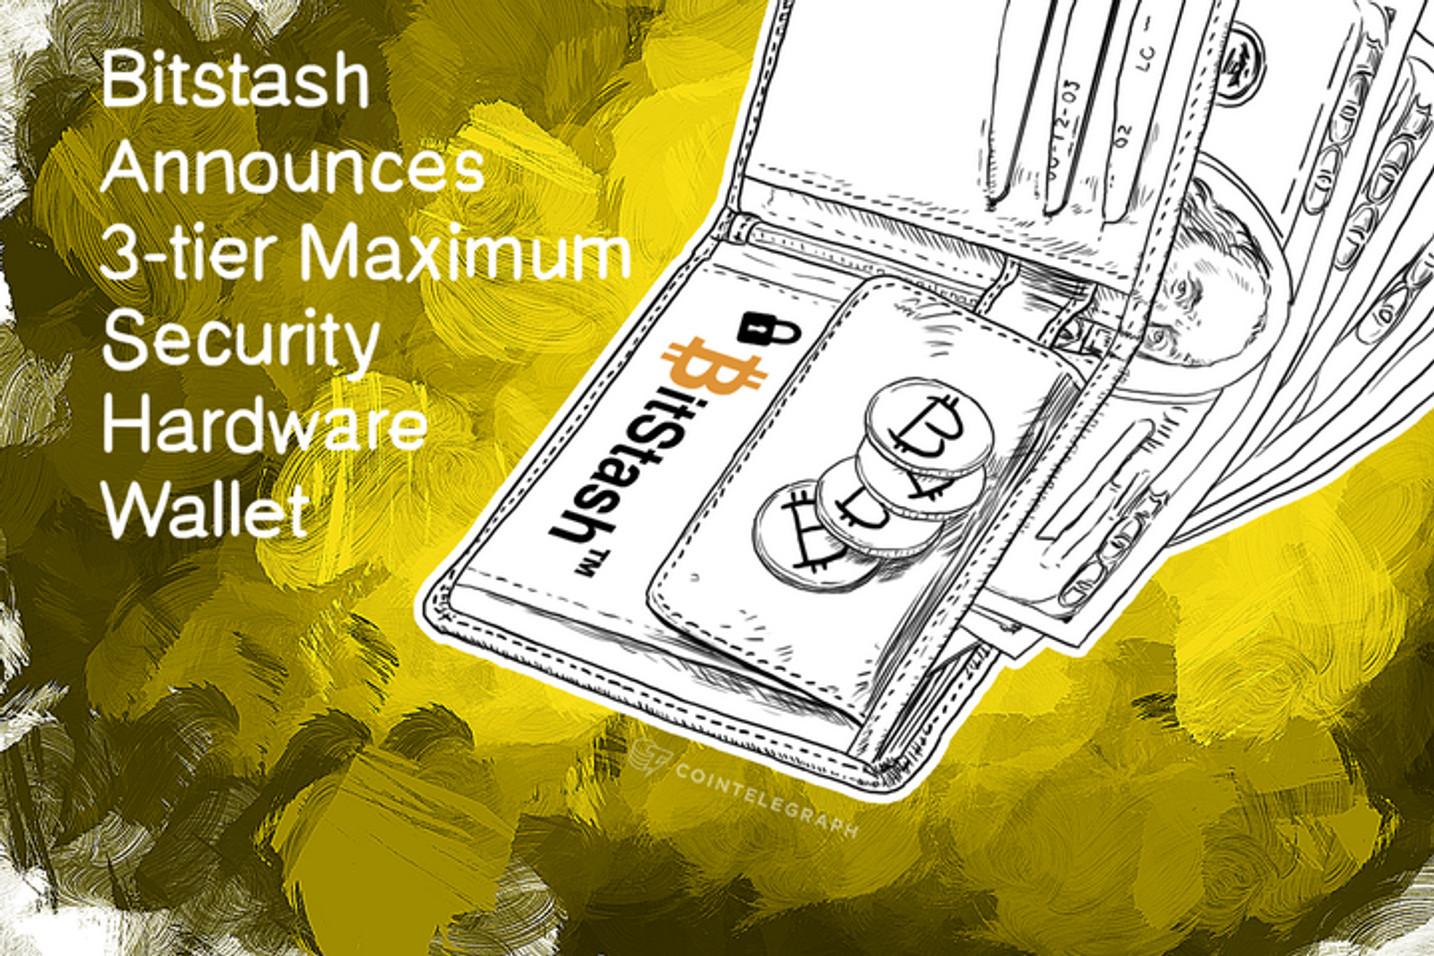 Bitstash Announces 3-tier Maximum Security Hardware Wallet